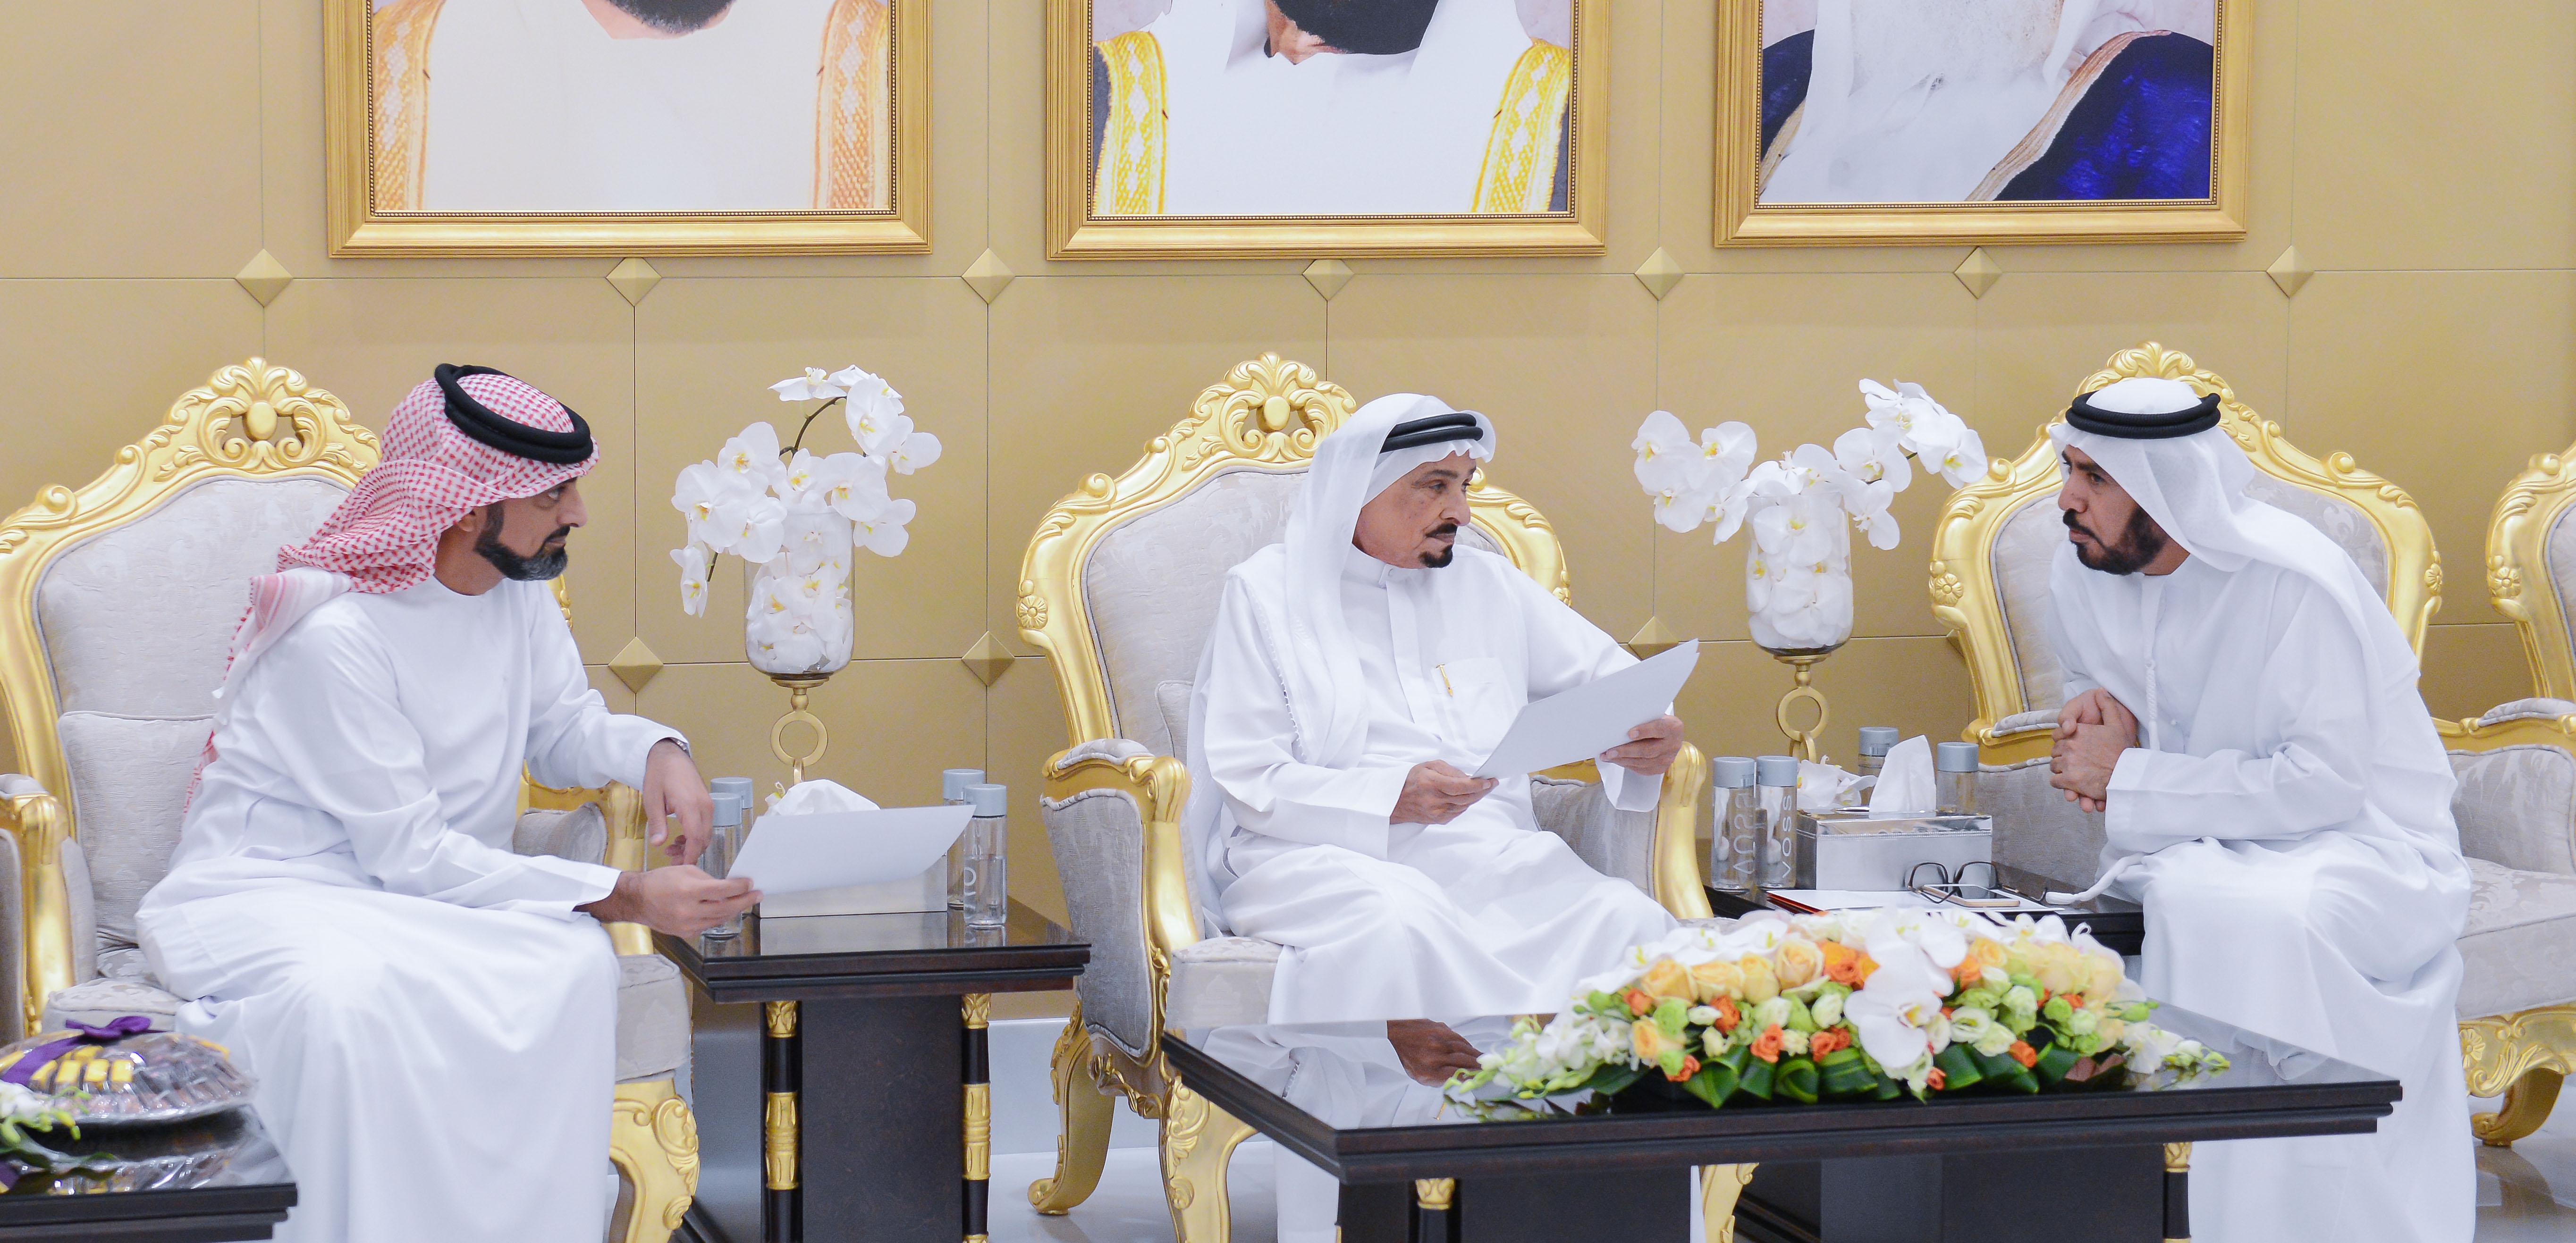 حاكم عجمان وولي عهده يواصلان استقبال المهنئين بشهر رمضان